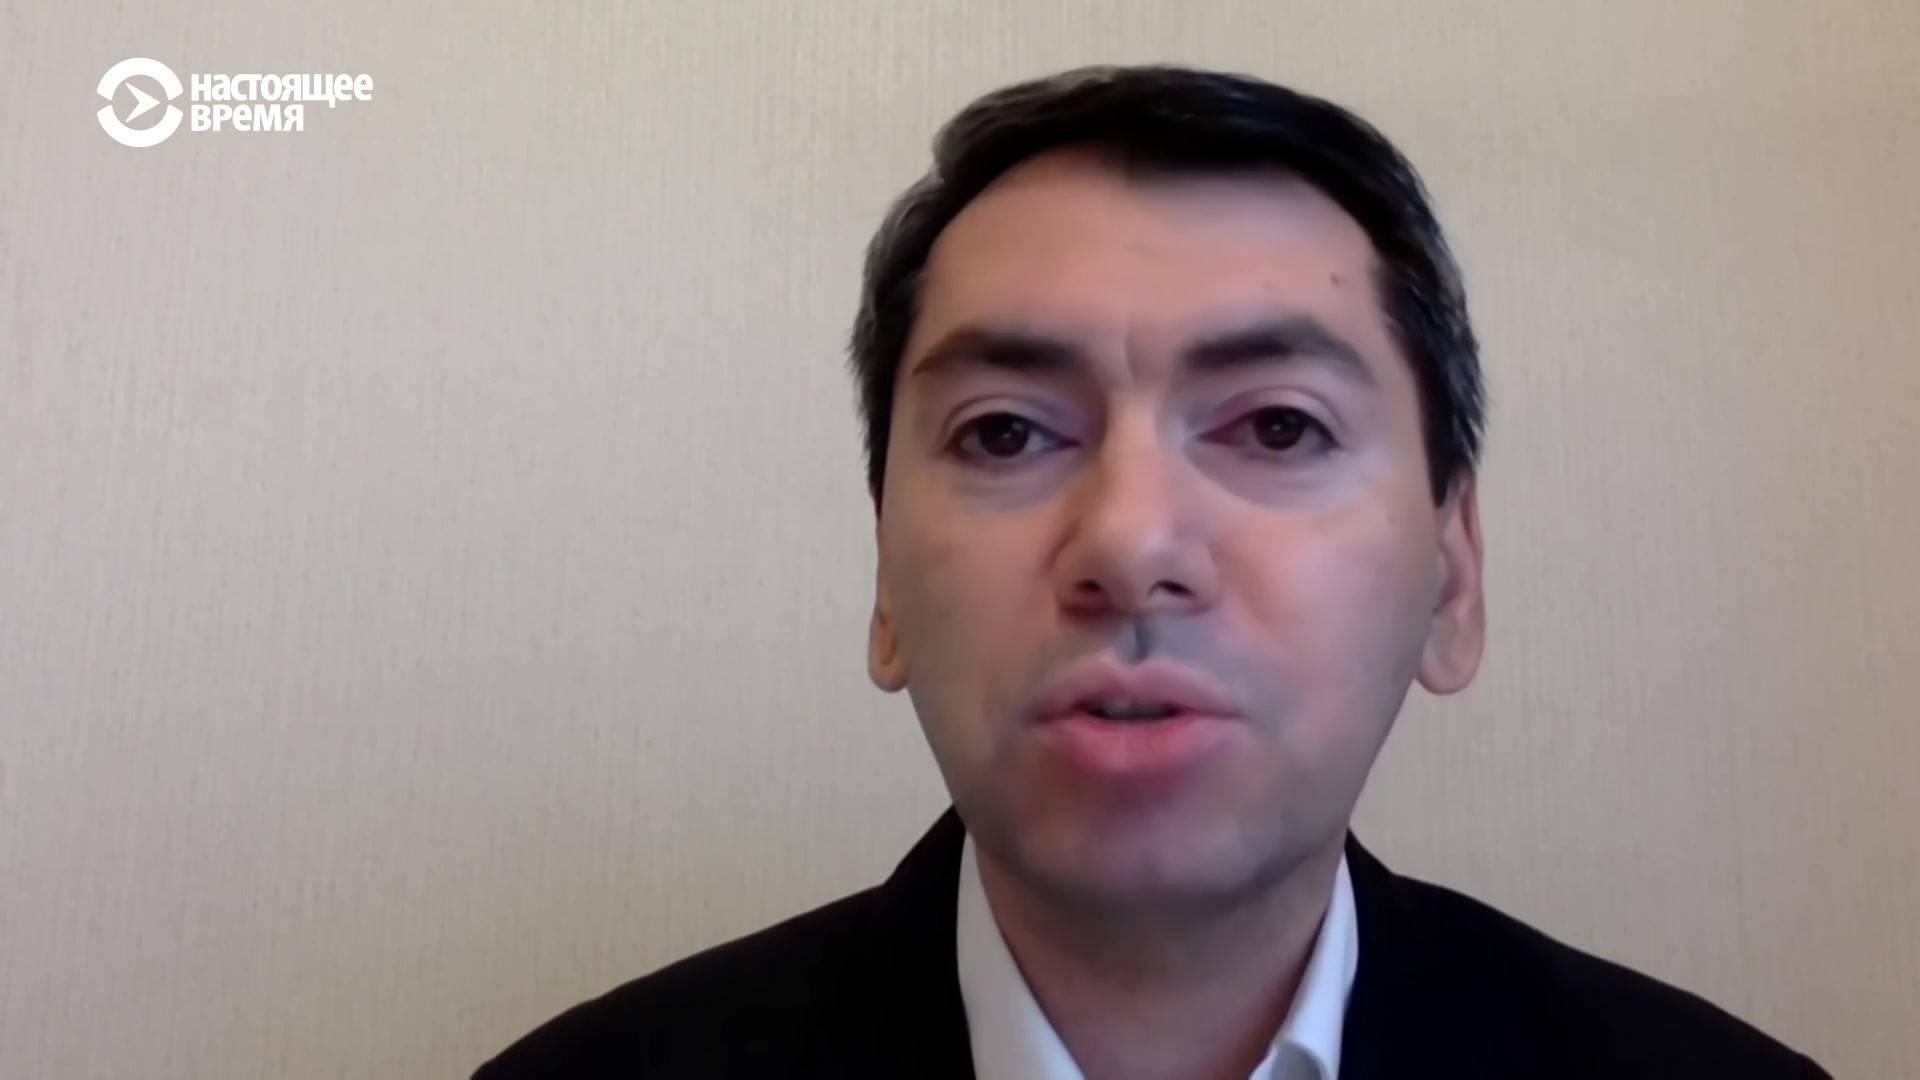 Котов Константин Александрович – лауреат Премии МХГ за мужество, проявленное в защите прав человека.